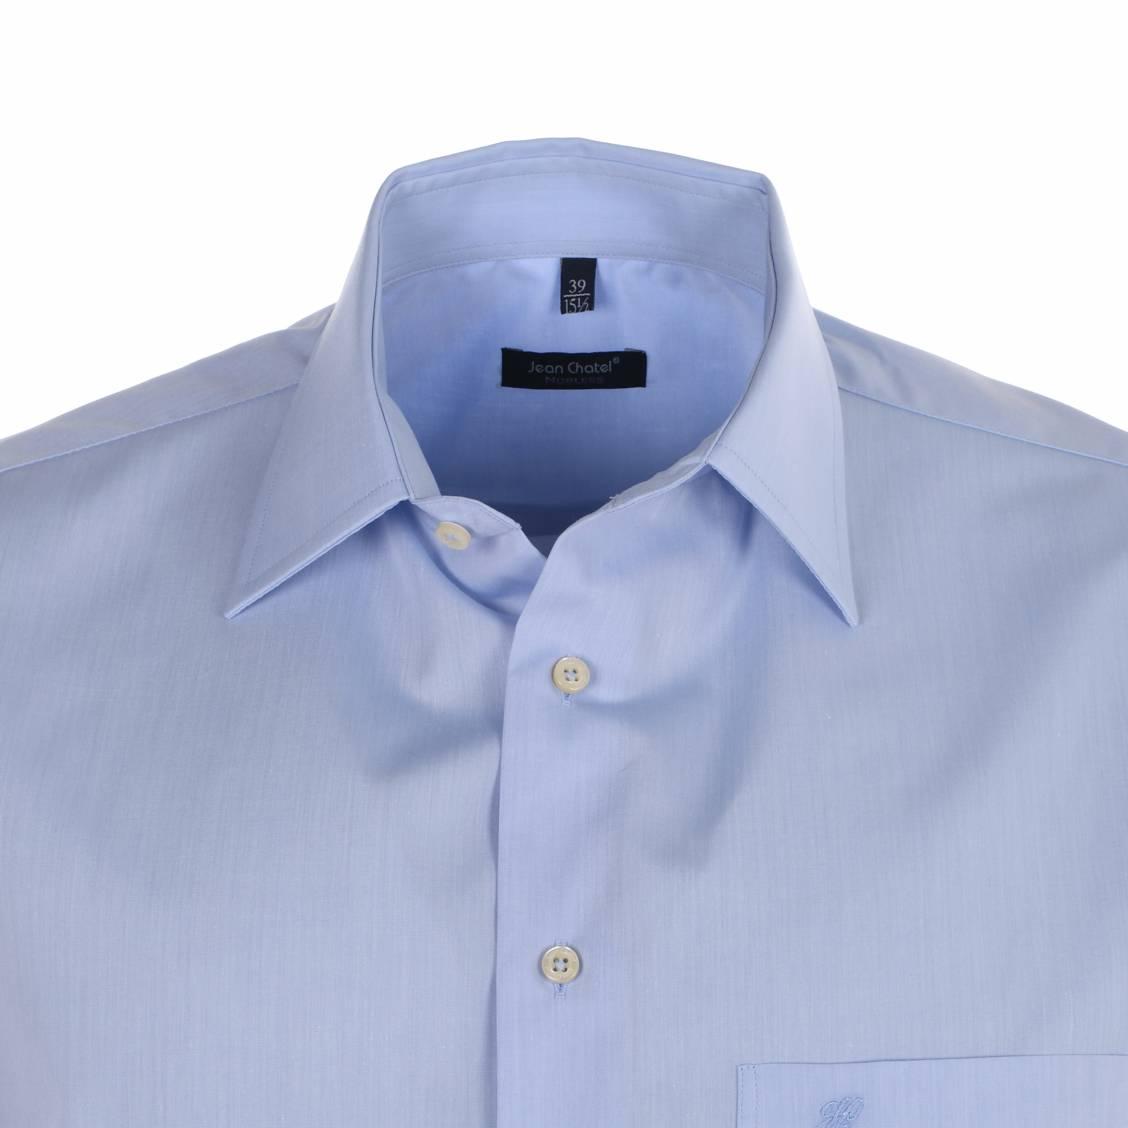 chemise homme sans repassage chambray ciel rue des hommes. Black Bedroom Furniture Sets. Home Design Ideas